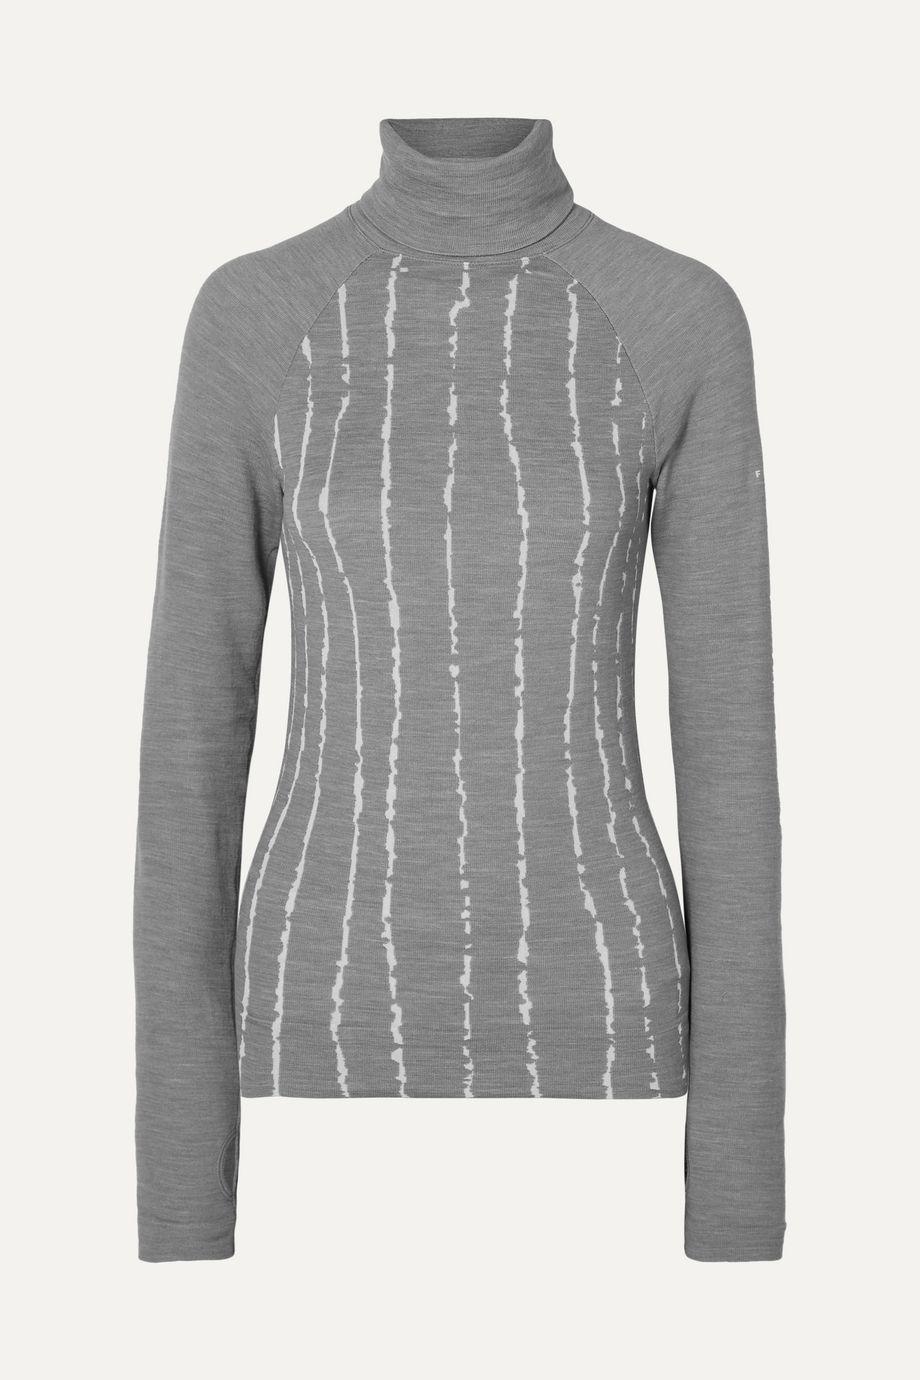 FALKE Ergonomic Sport System Striped wool-blend turtleneck top